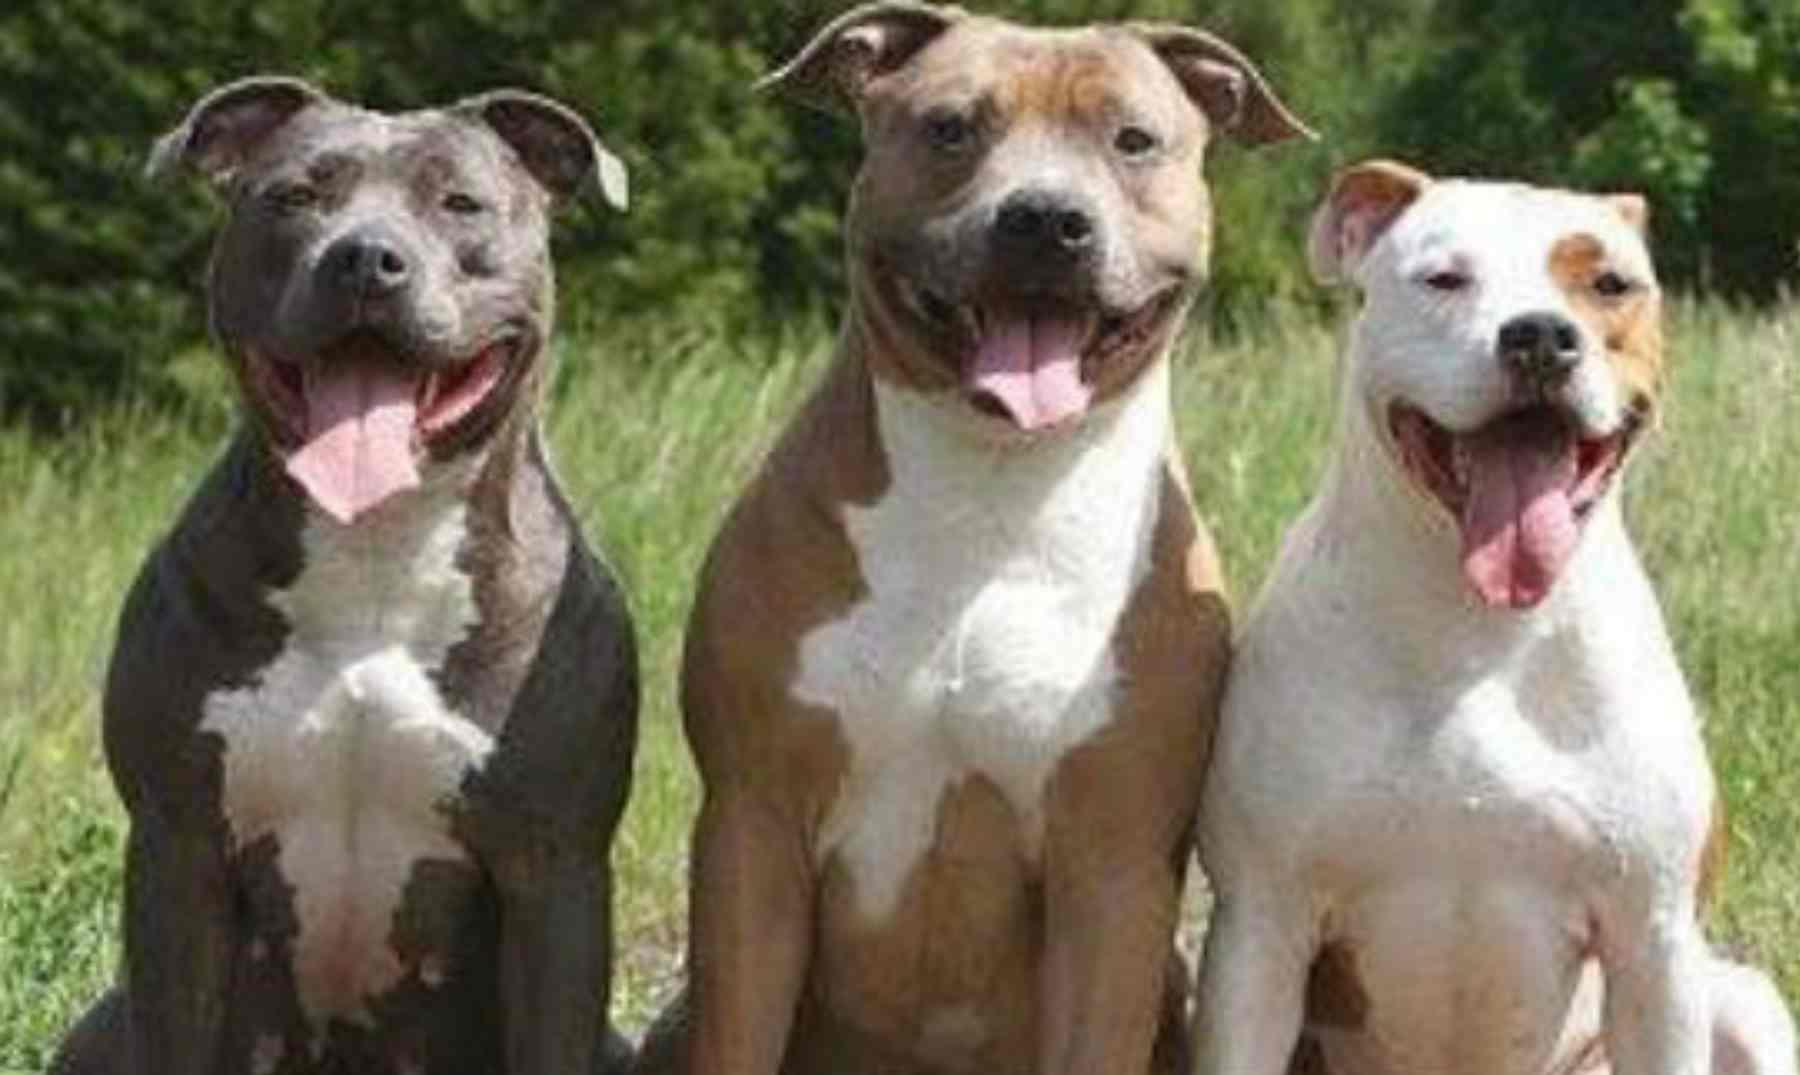 criar a un cachorro pitbull,adiestramiento a un pitbull,educar a un pitbull